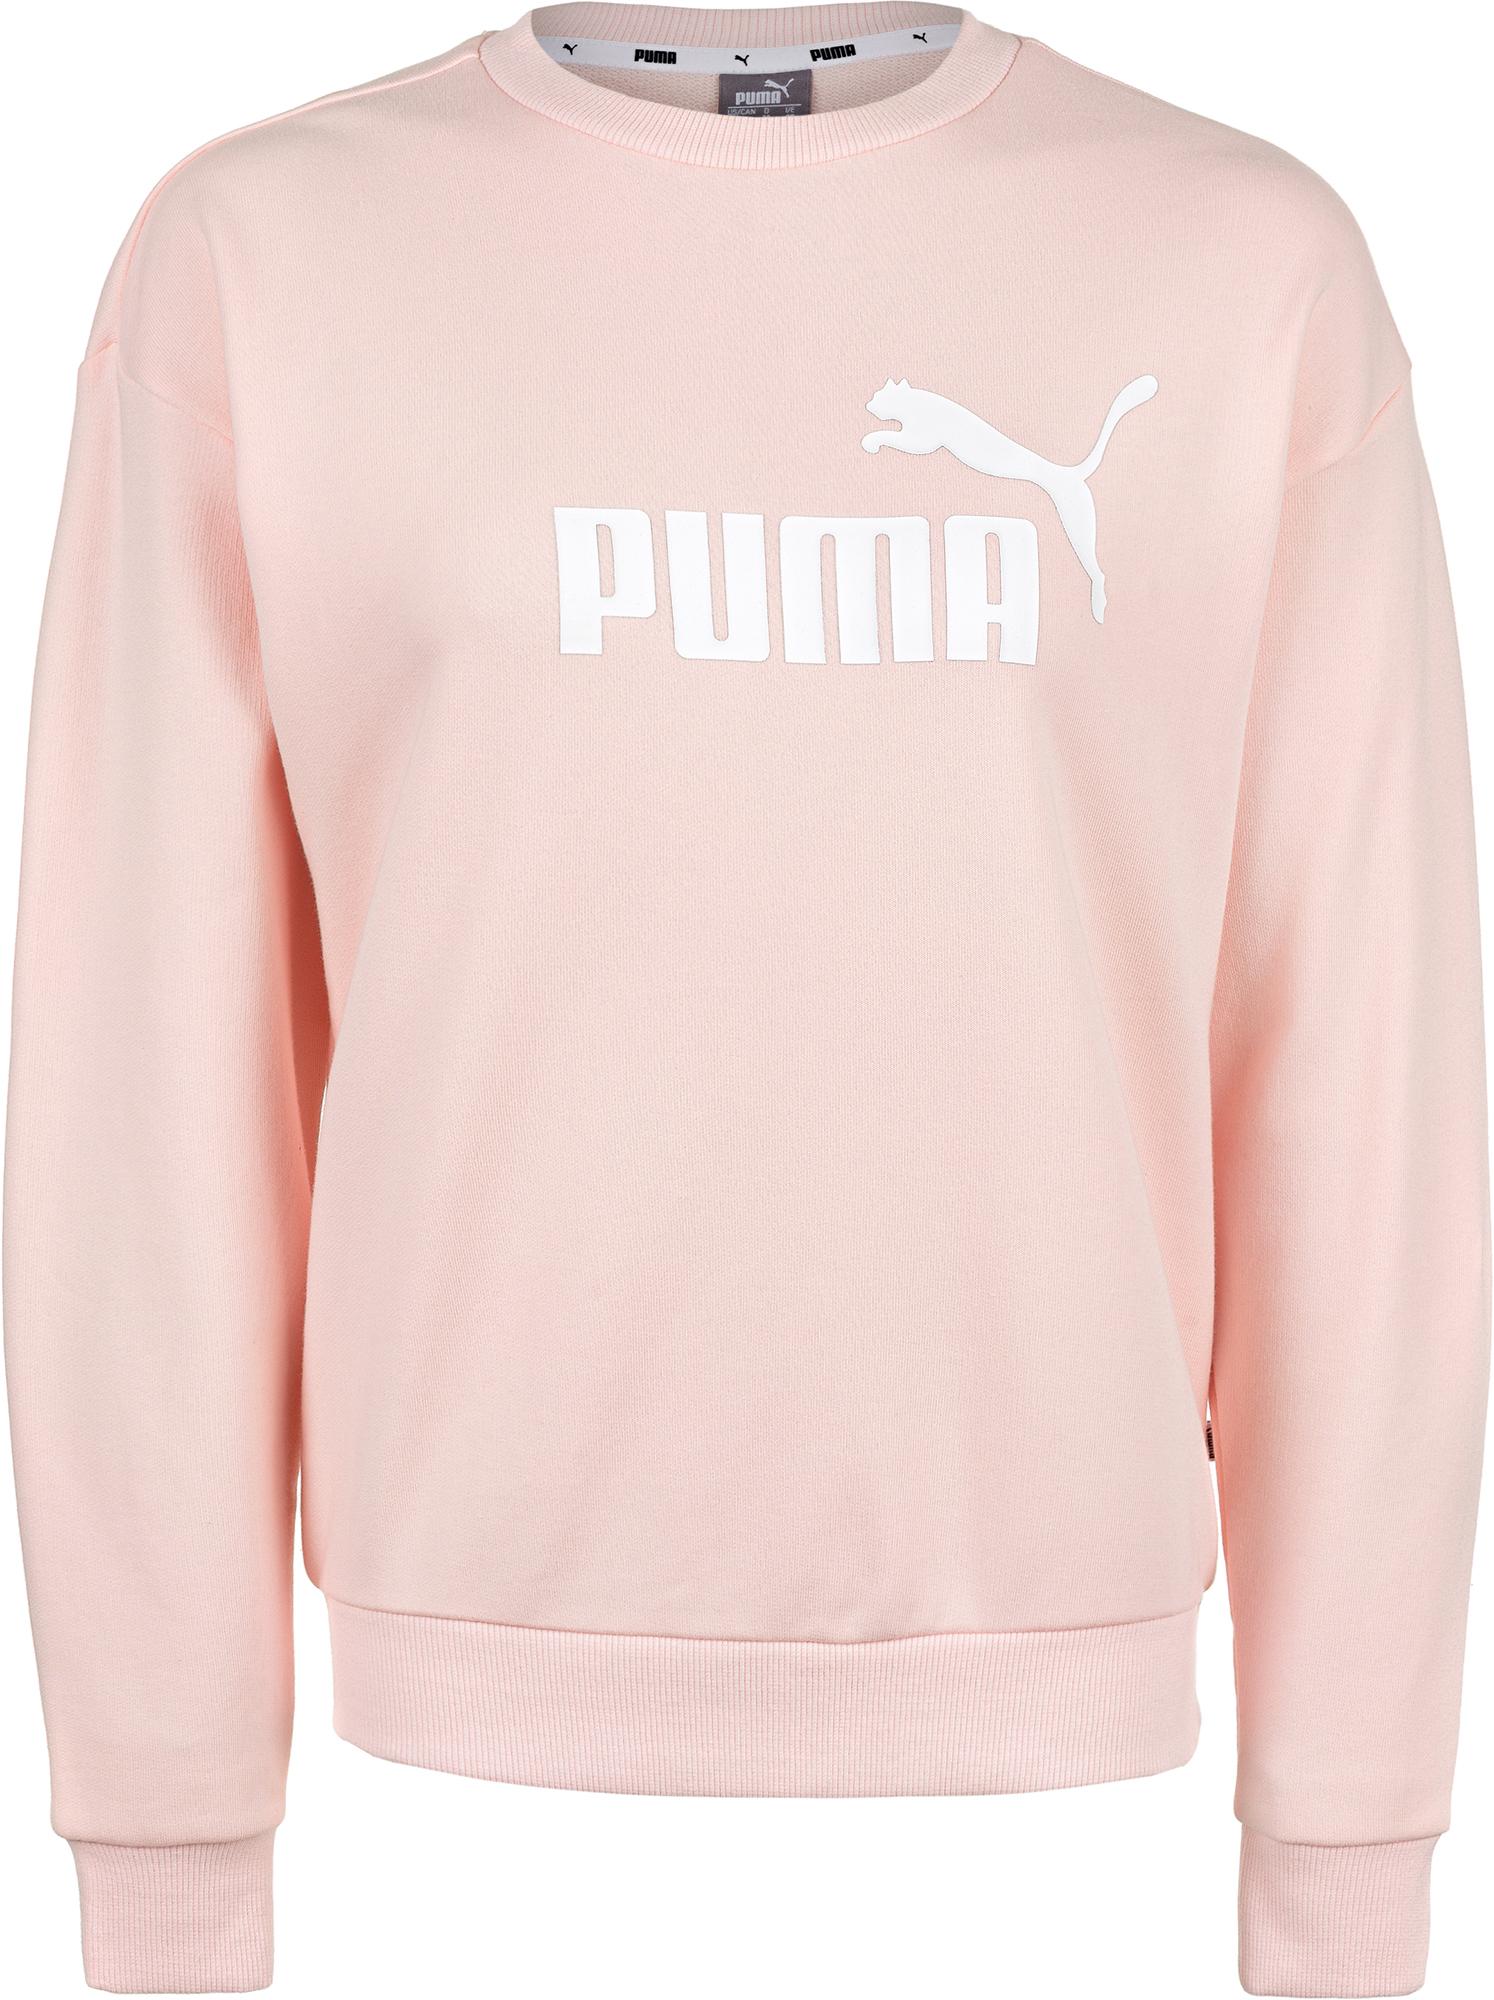 Фото - Puma Свитшот женский Puma ESS Logo Crew, размер 42-44 ess no 1 crew sweat tr w